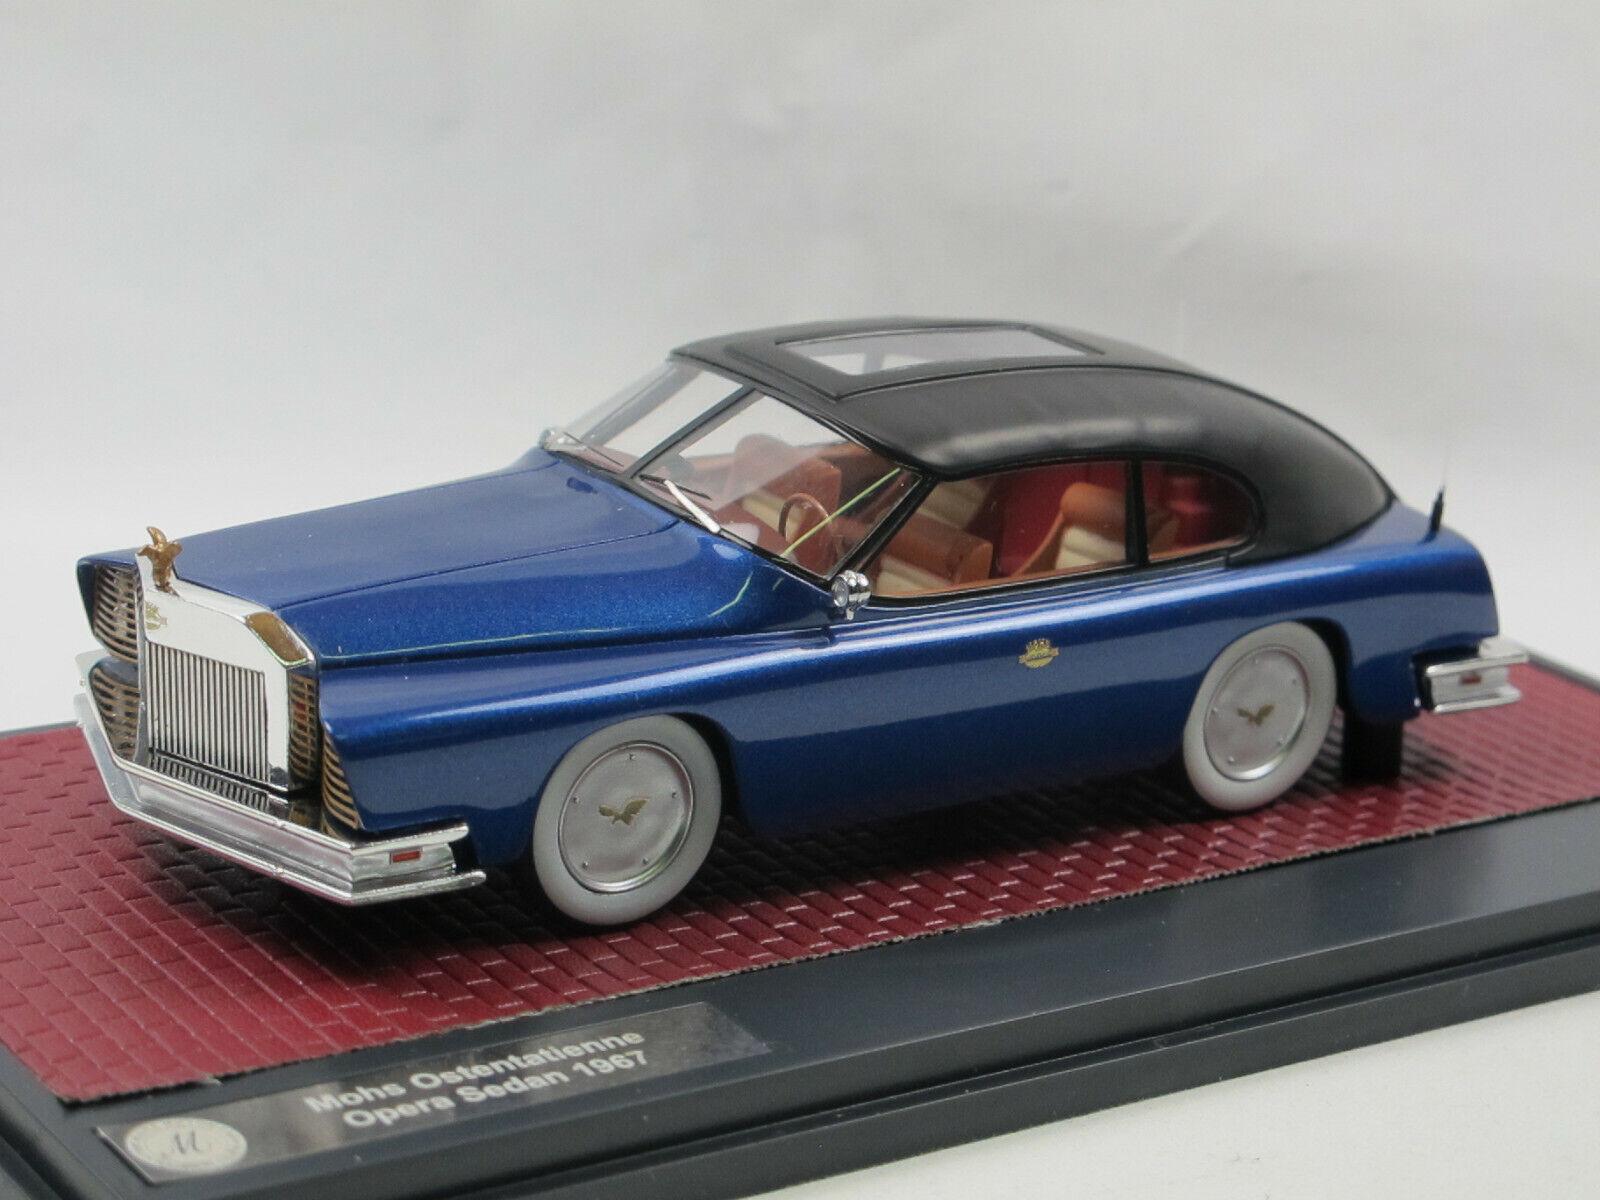 Matrix - modellen 1967 mohs ostentatienne opera sedan prototyp usa Blau 1   43